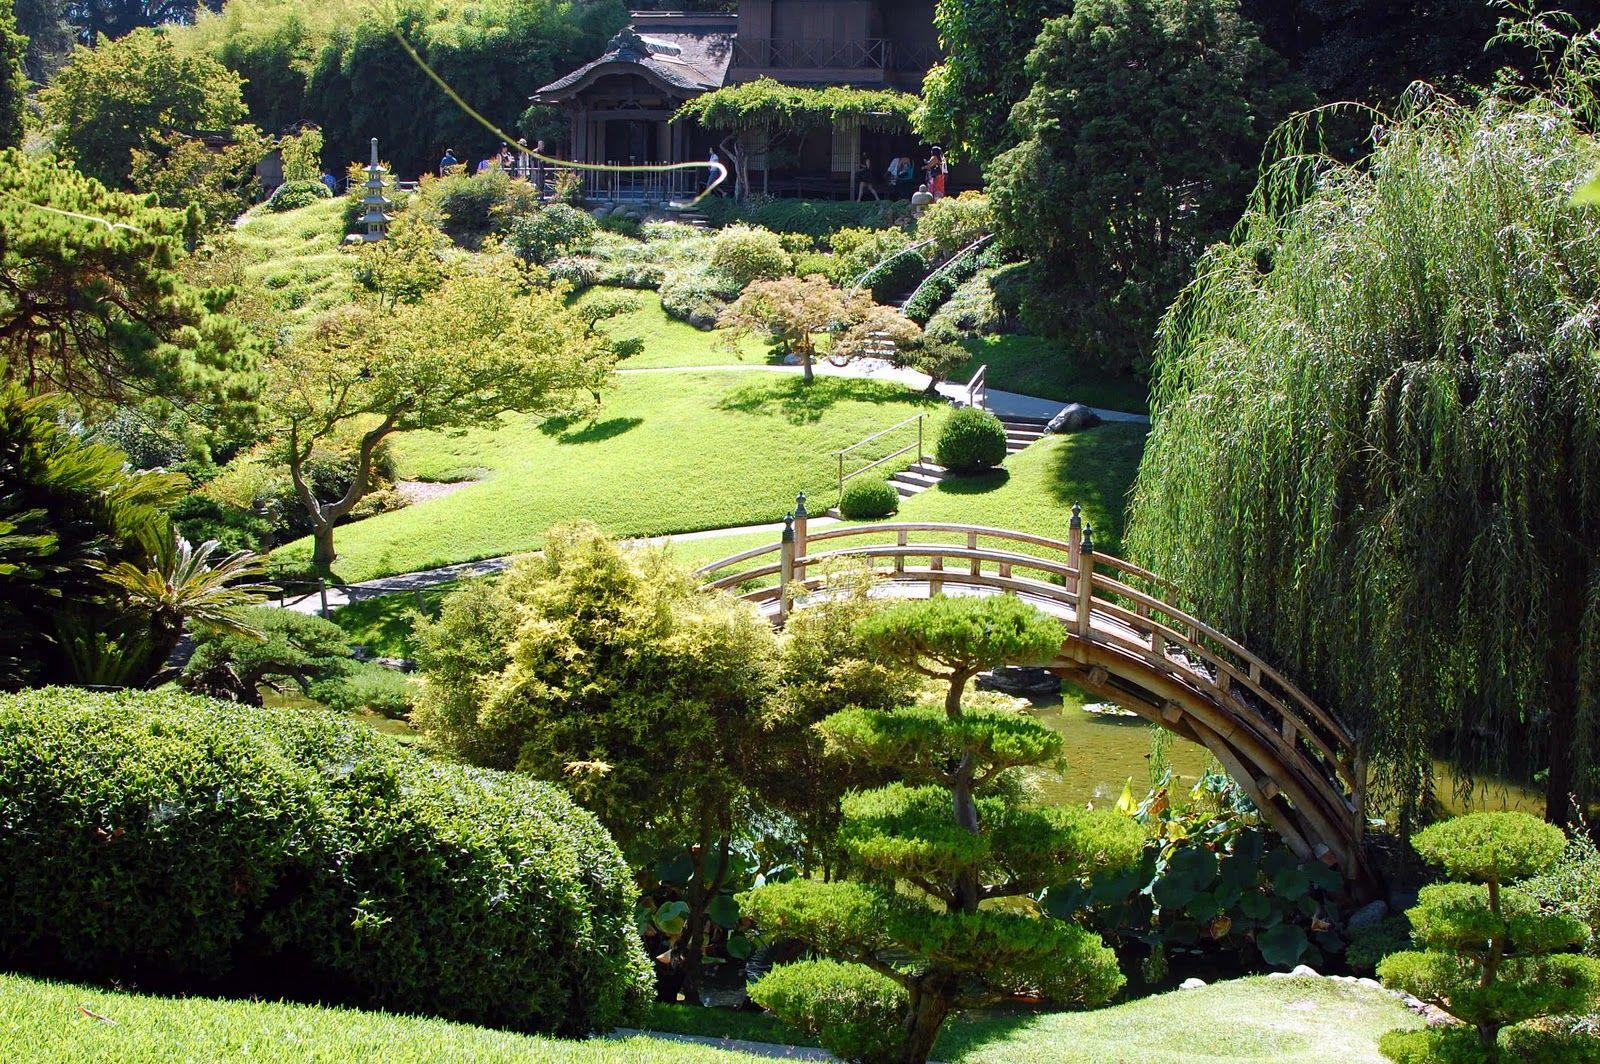 08684699f21bae1eaa94f154792b2f6d - Botanical Gardens Los Angeles Huntington Library